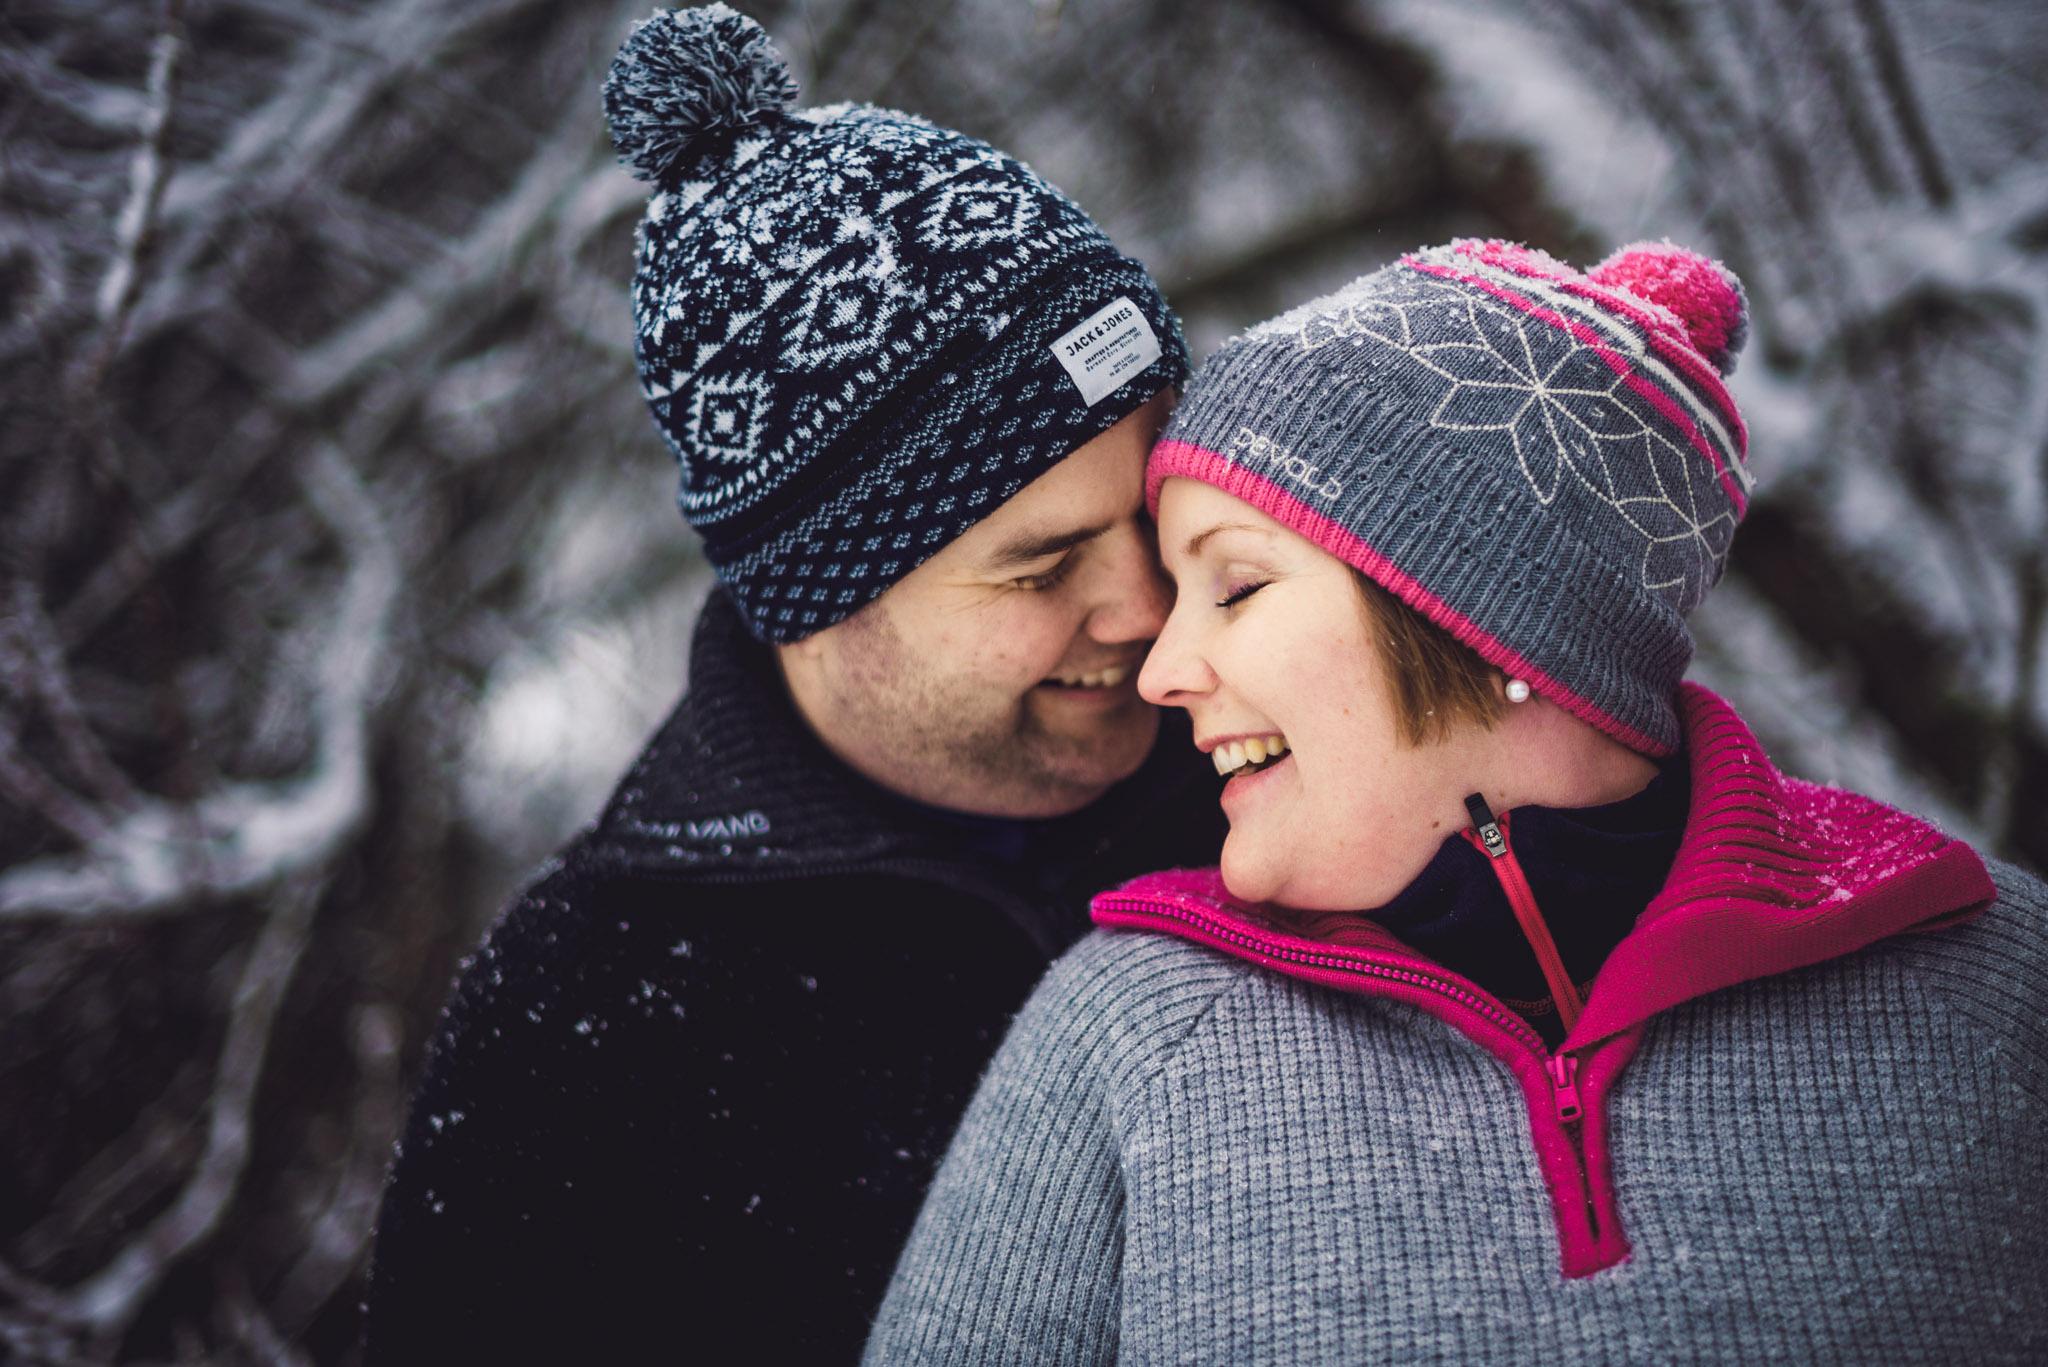 Bryllupsfotograf- stavanger-forlovet-vinterbilder-eirik-halvorsen-9.jpg